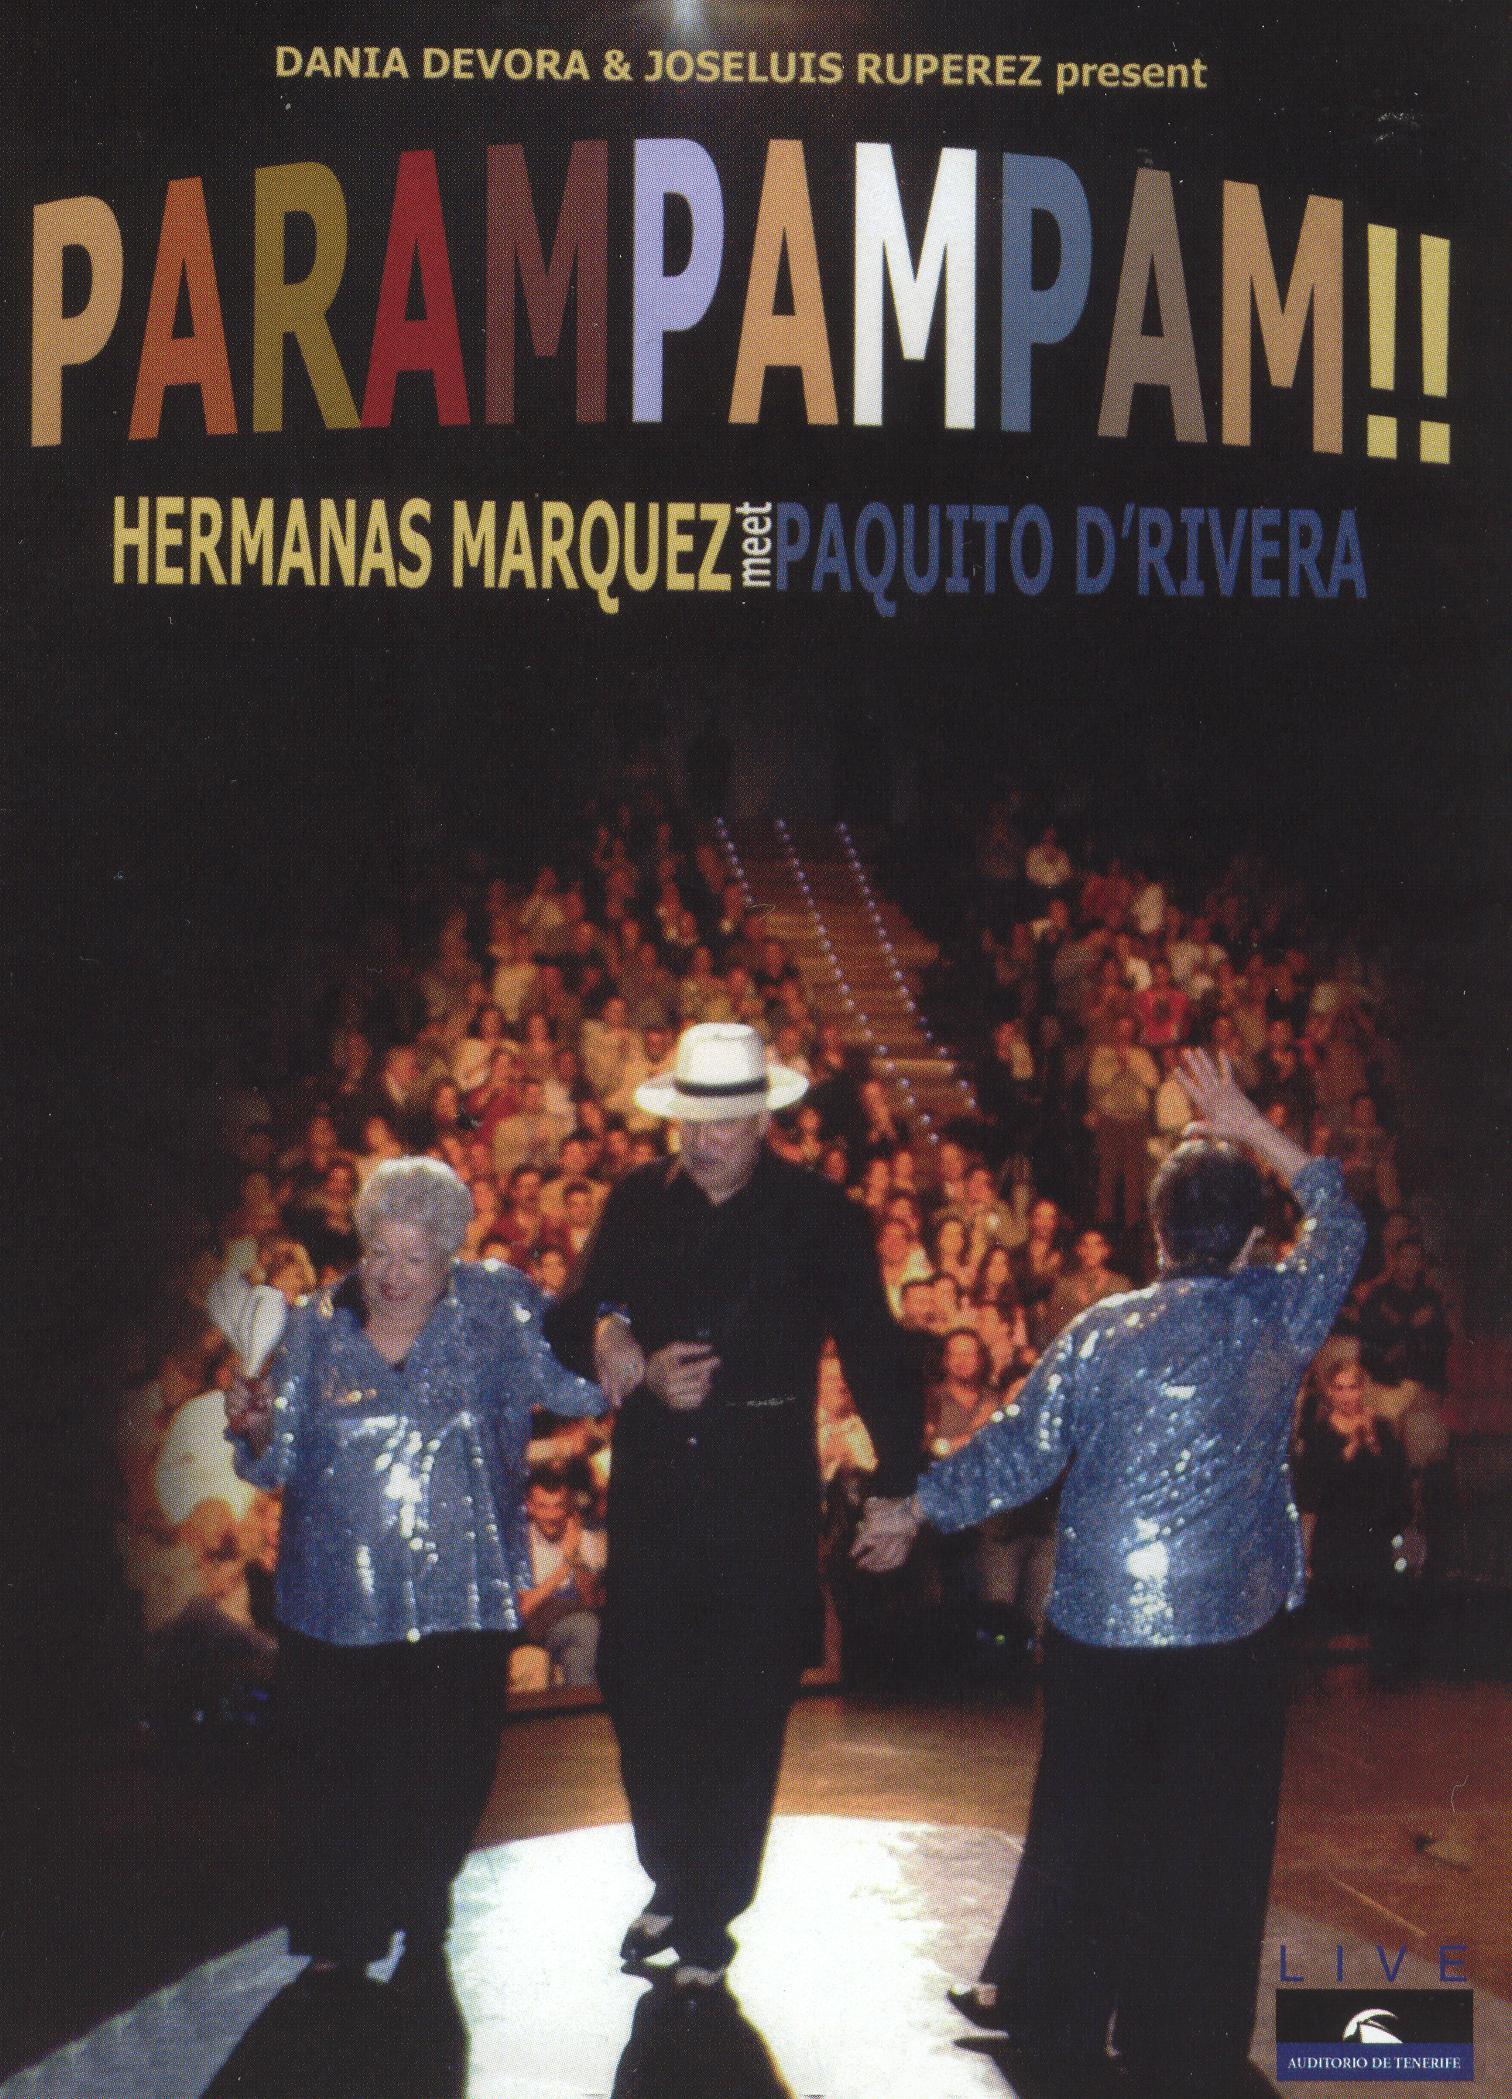 Parampampam: Hermanas Marquez Meet Paquito D'Rivera